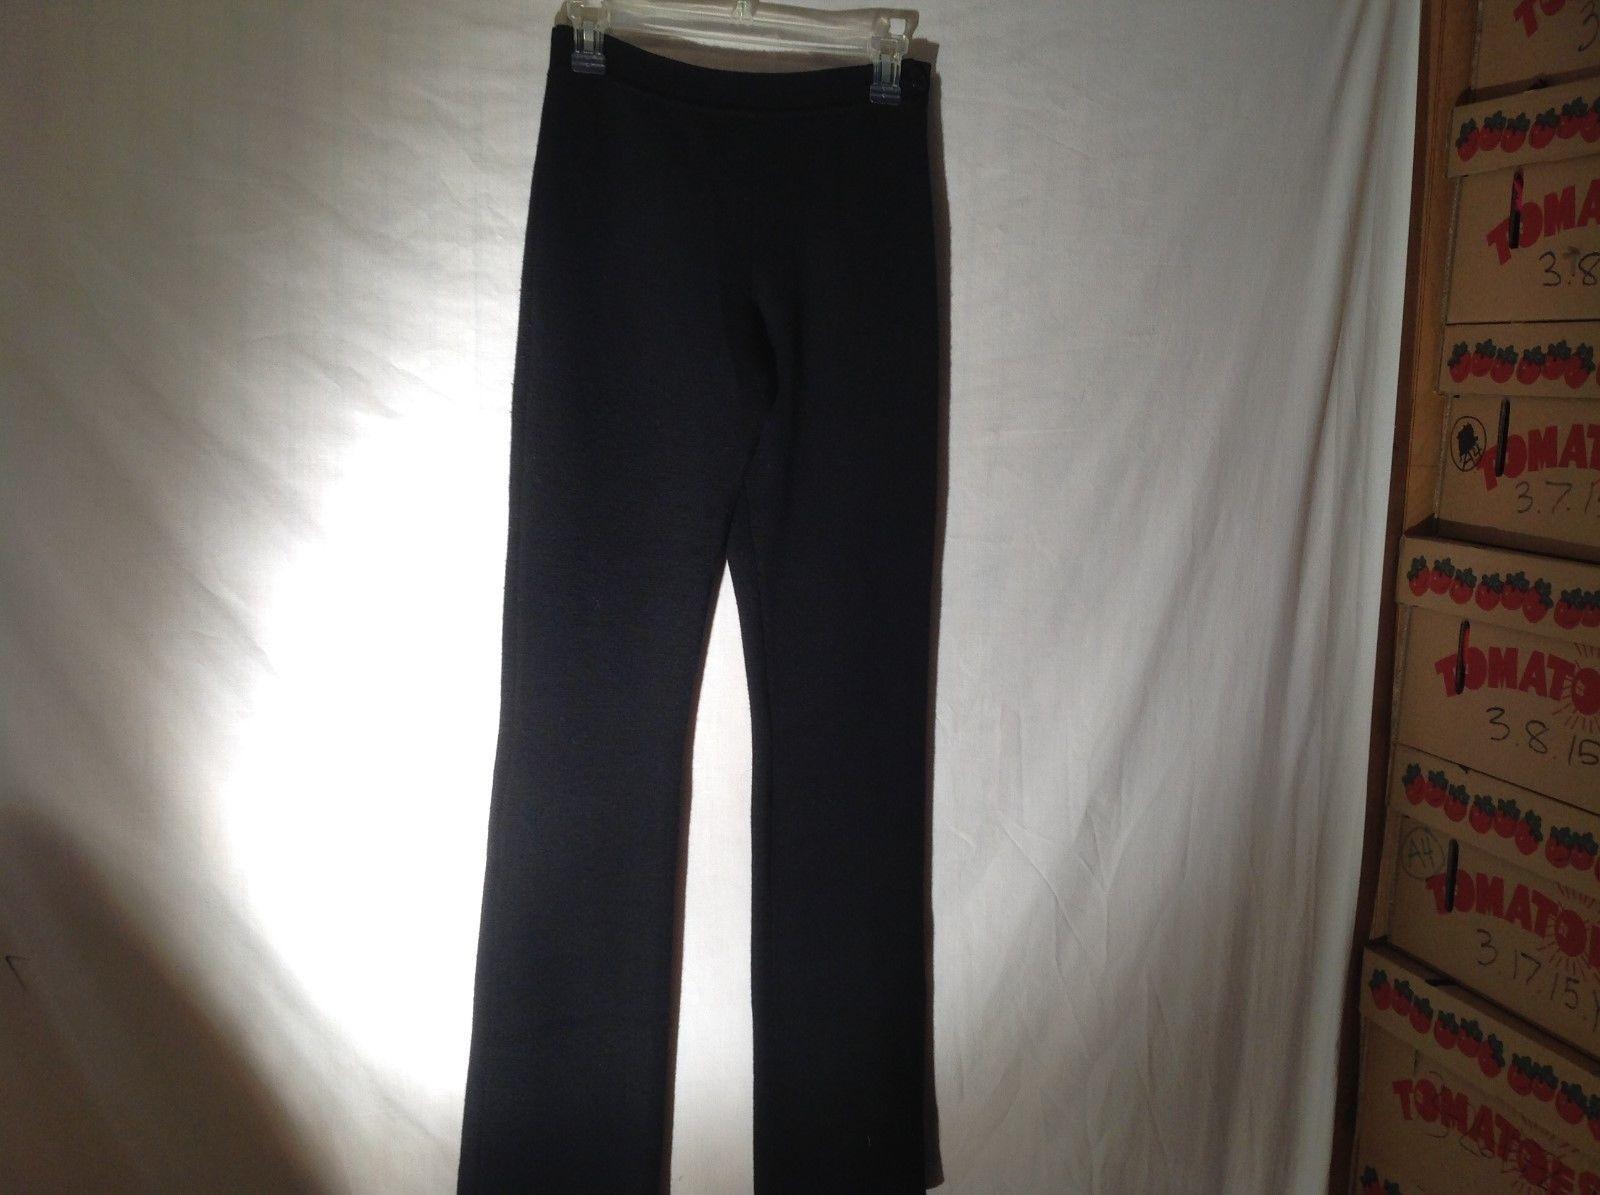 Quality Womens Black Stretchy Pants by Leoffler Randall